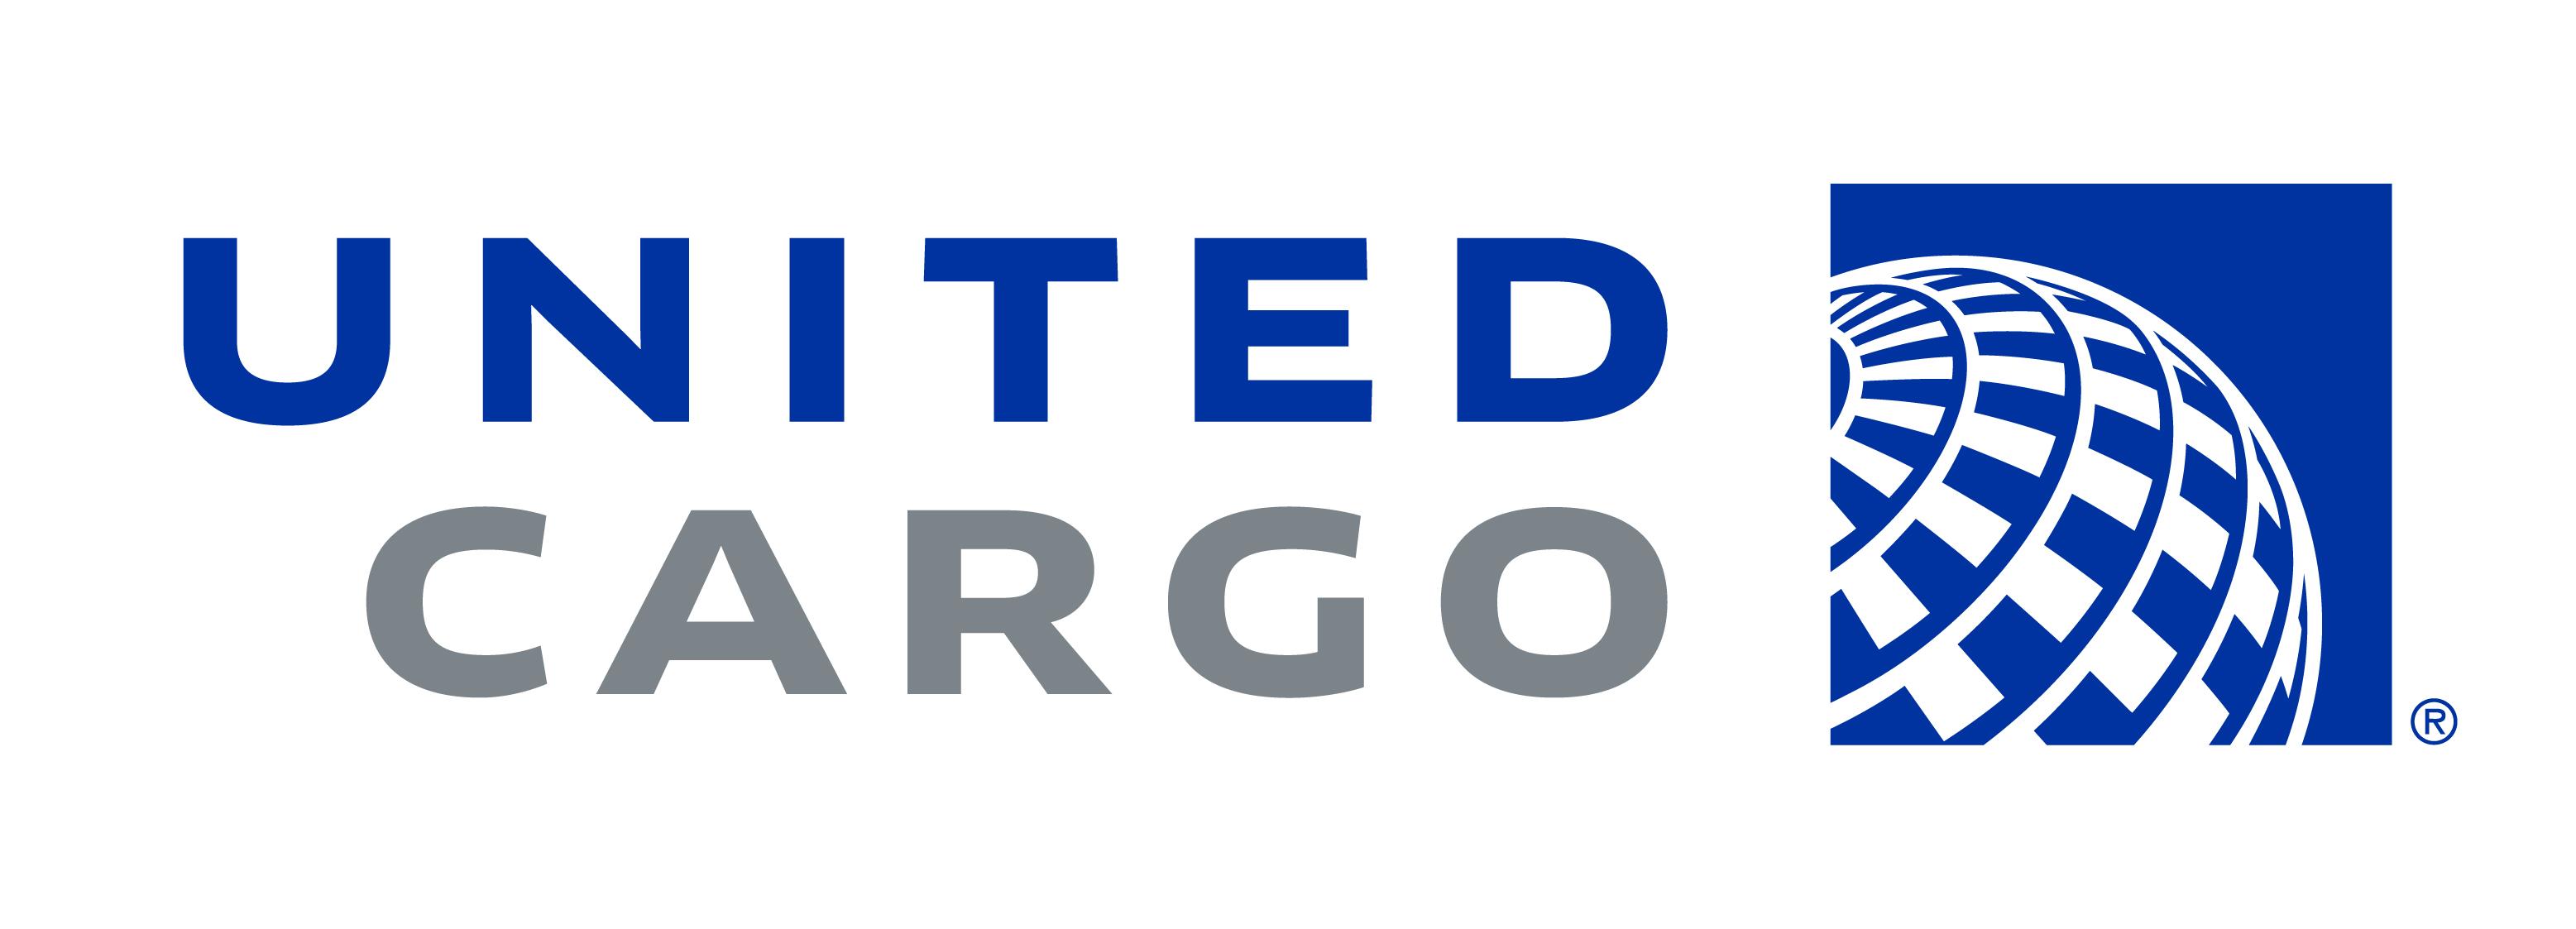 N1_125-UnitedCargo-30-logo1-1522165090